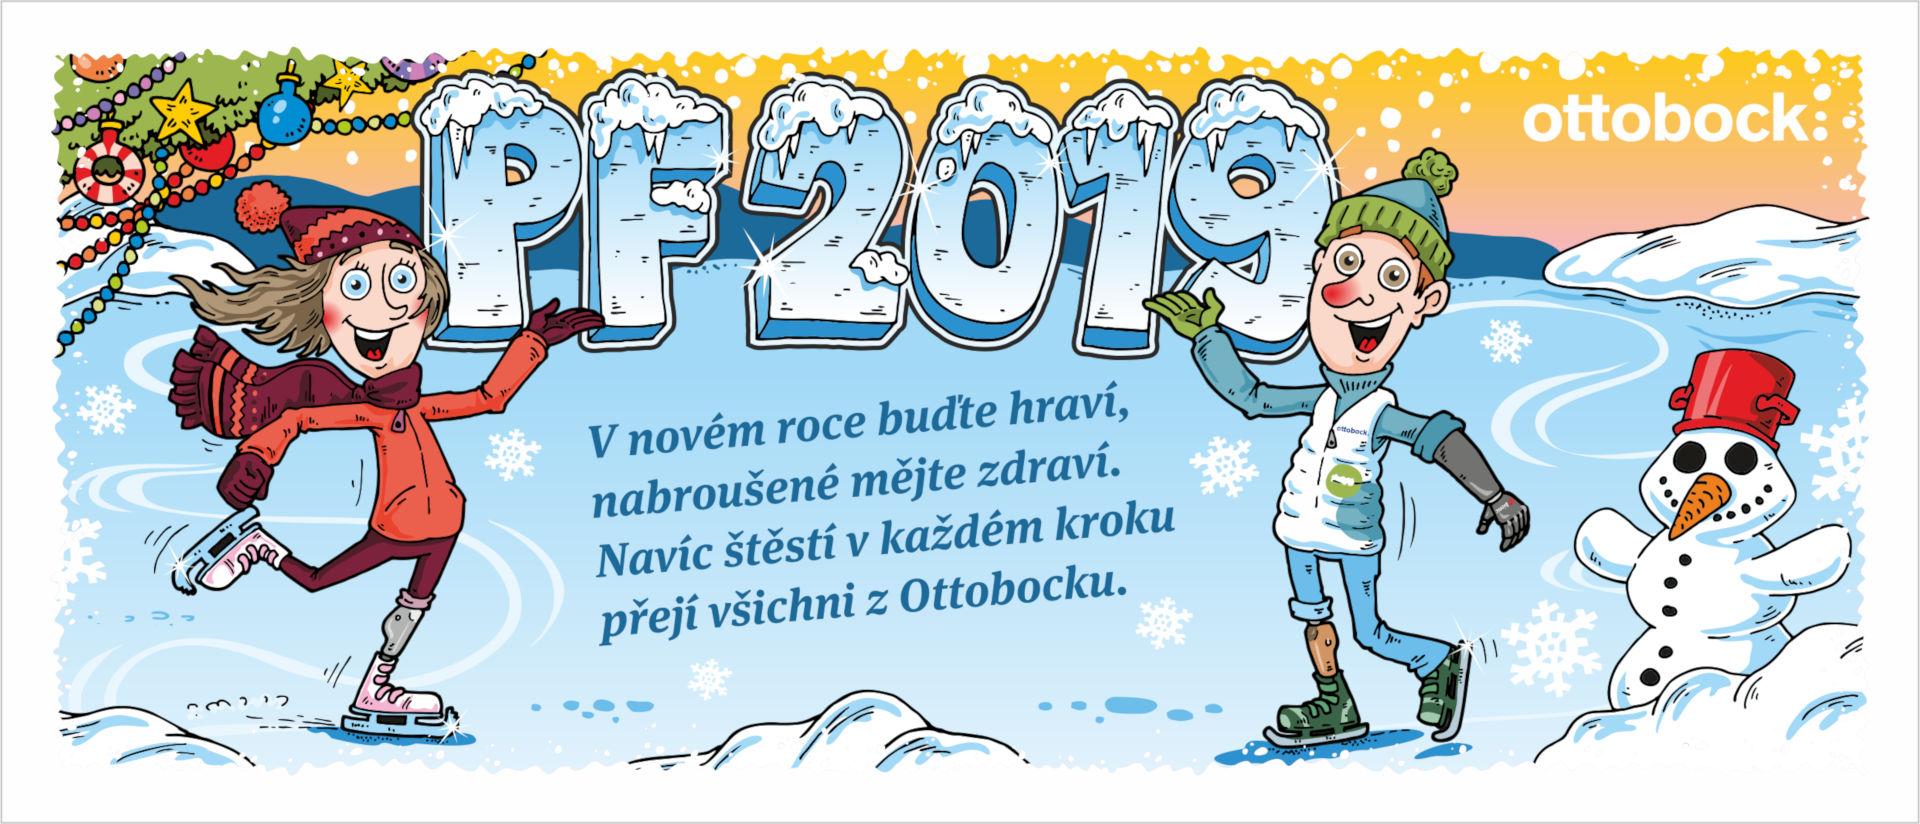 Ottobock PF 2019